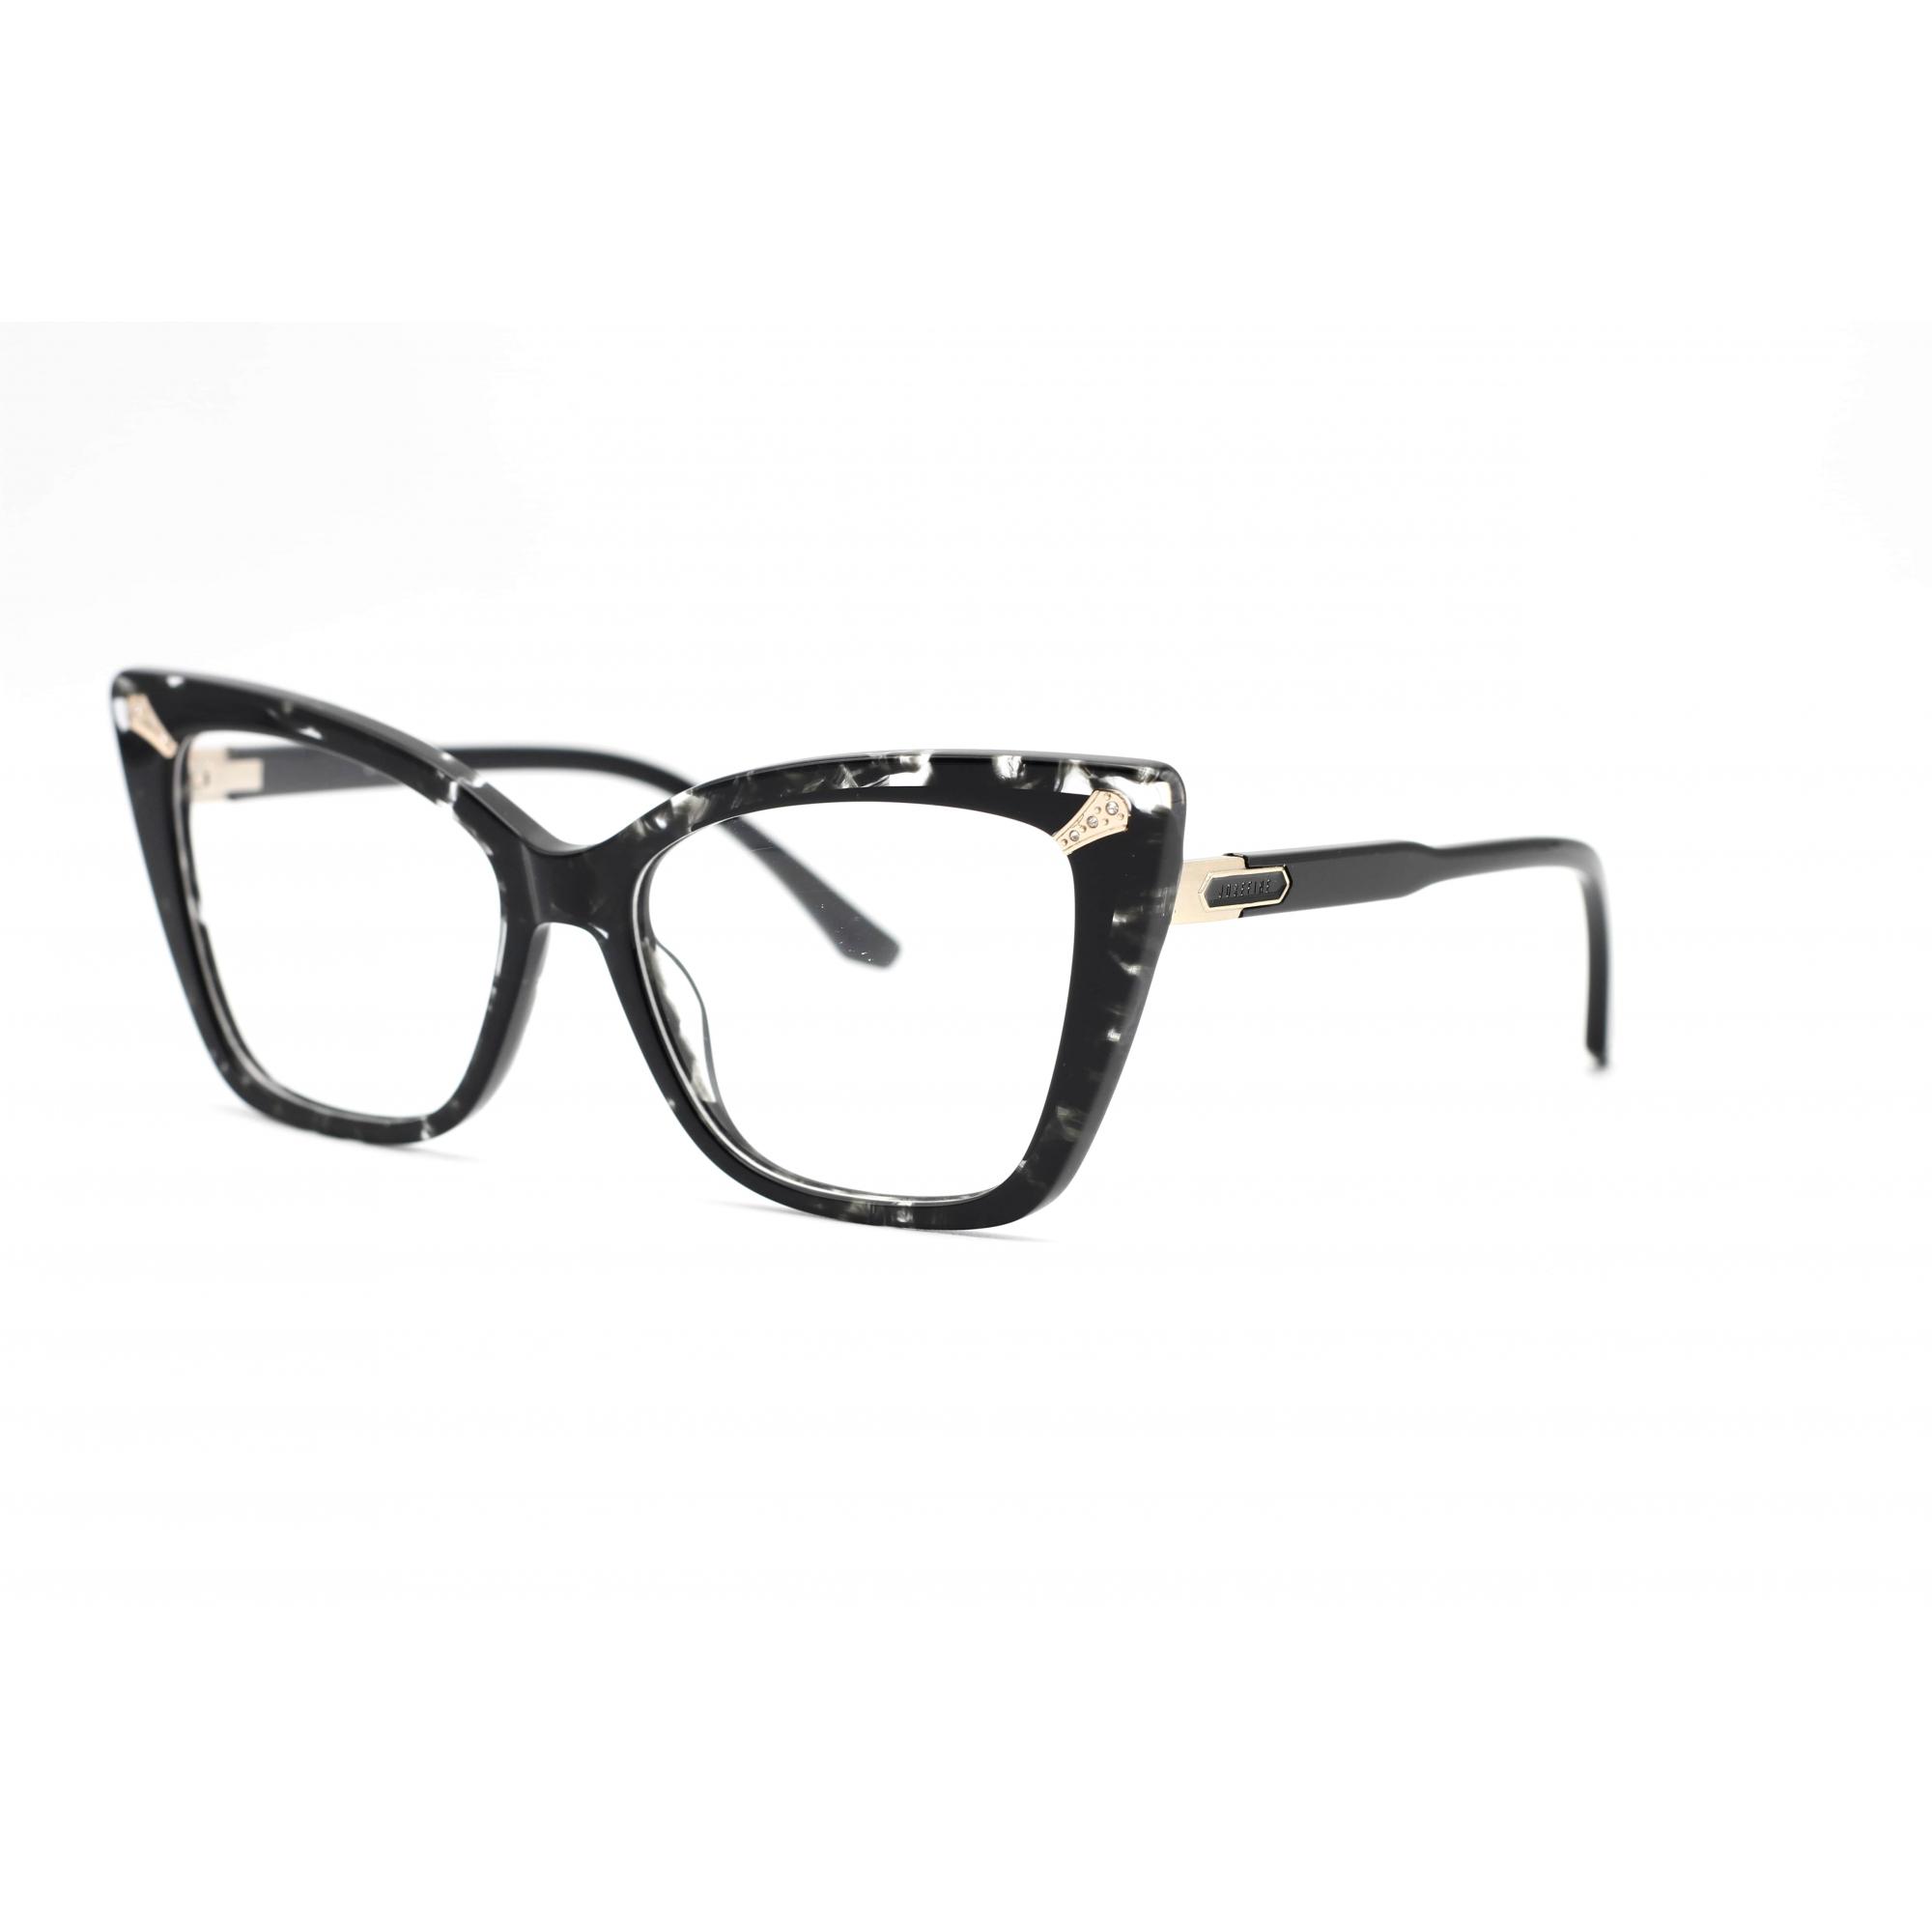 Armação para óculos marca Josefine  MB4628 C4 54